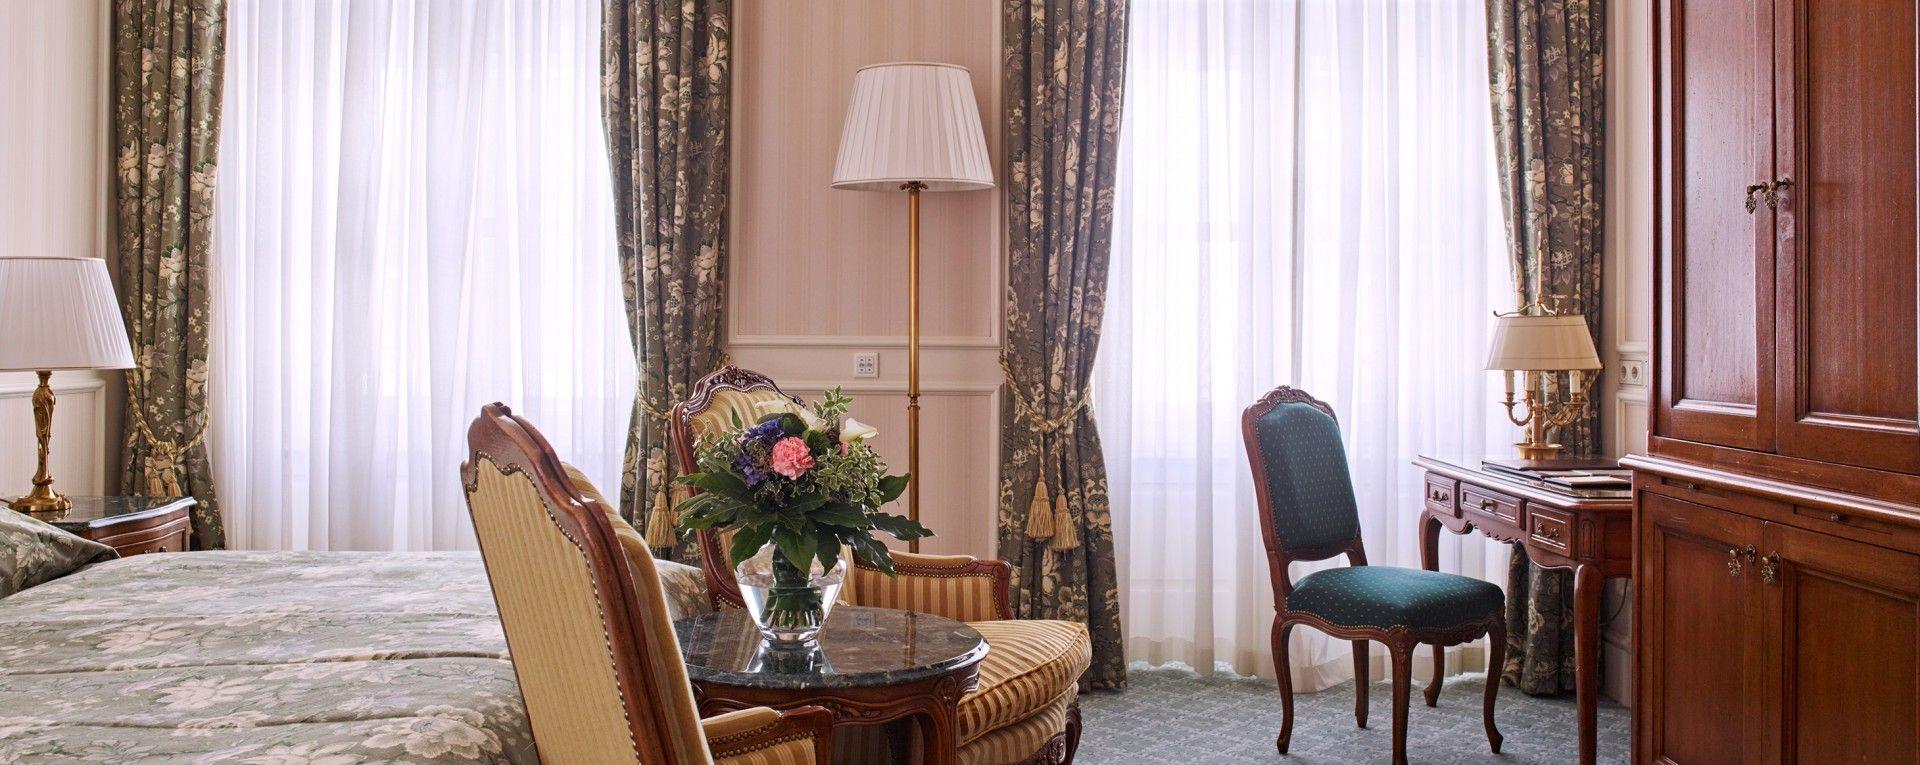 Grand Hotel Wien Karntner Ring